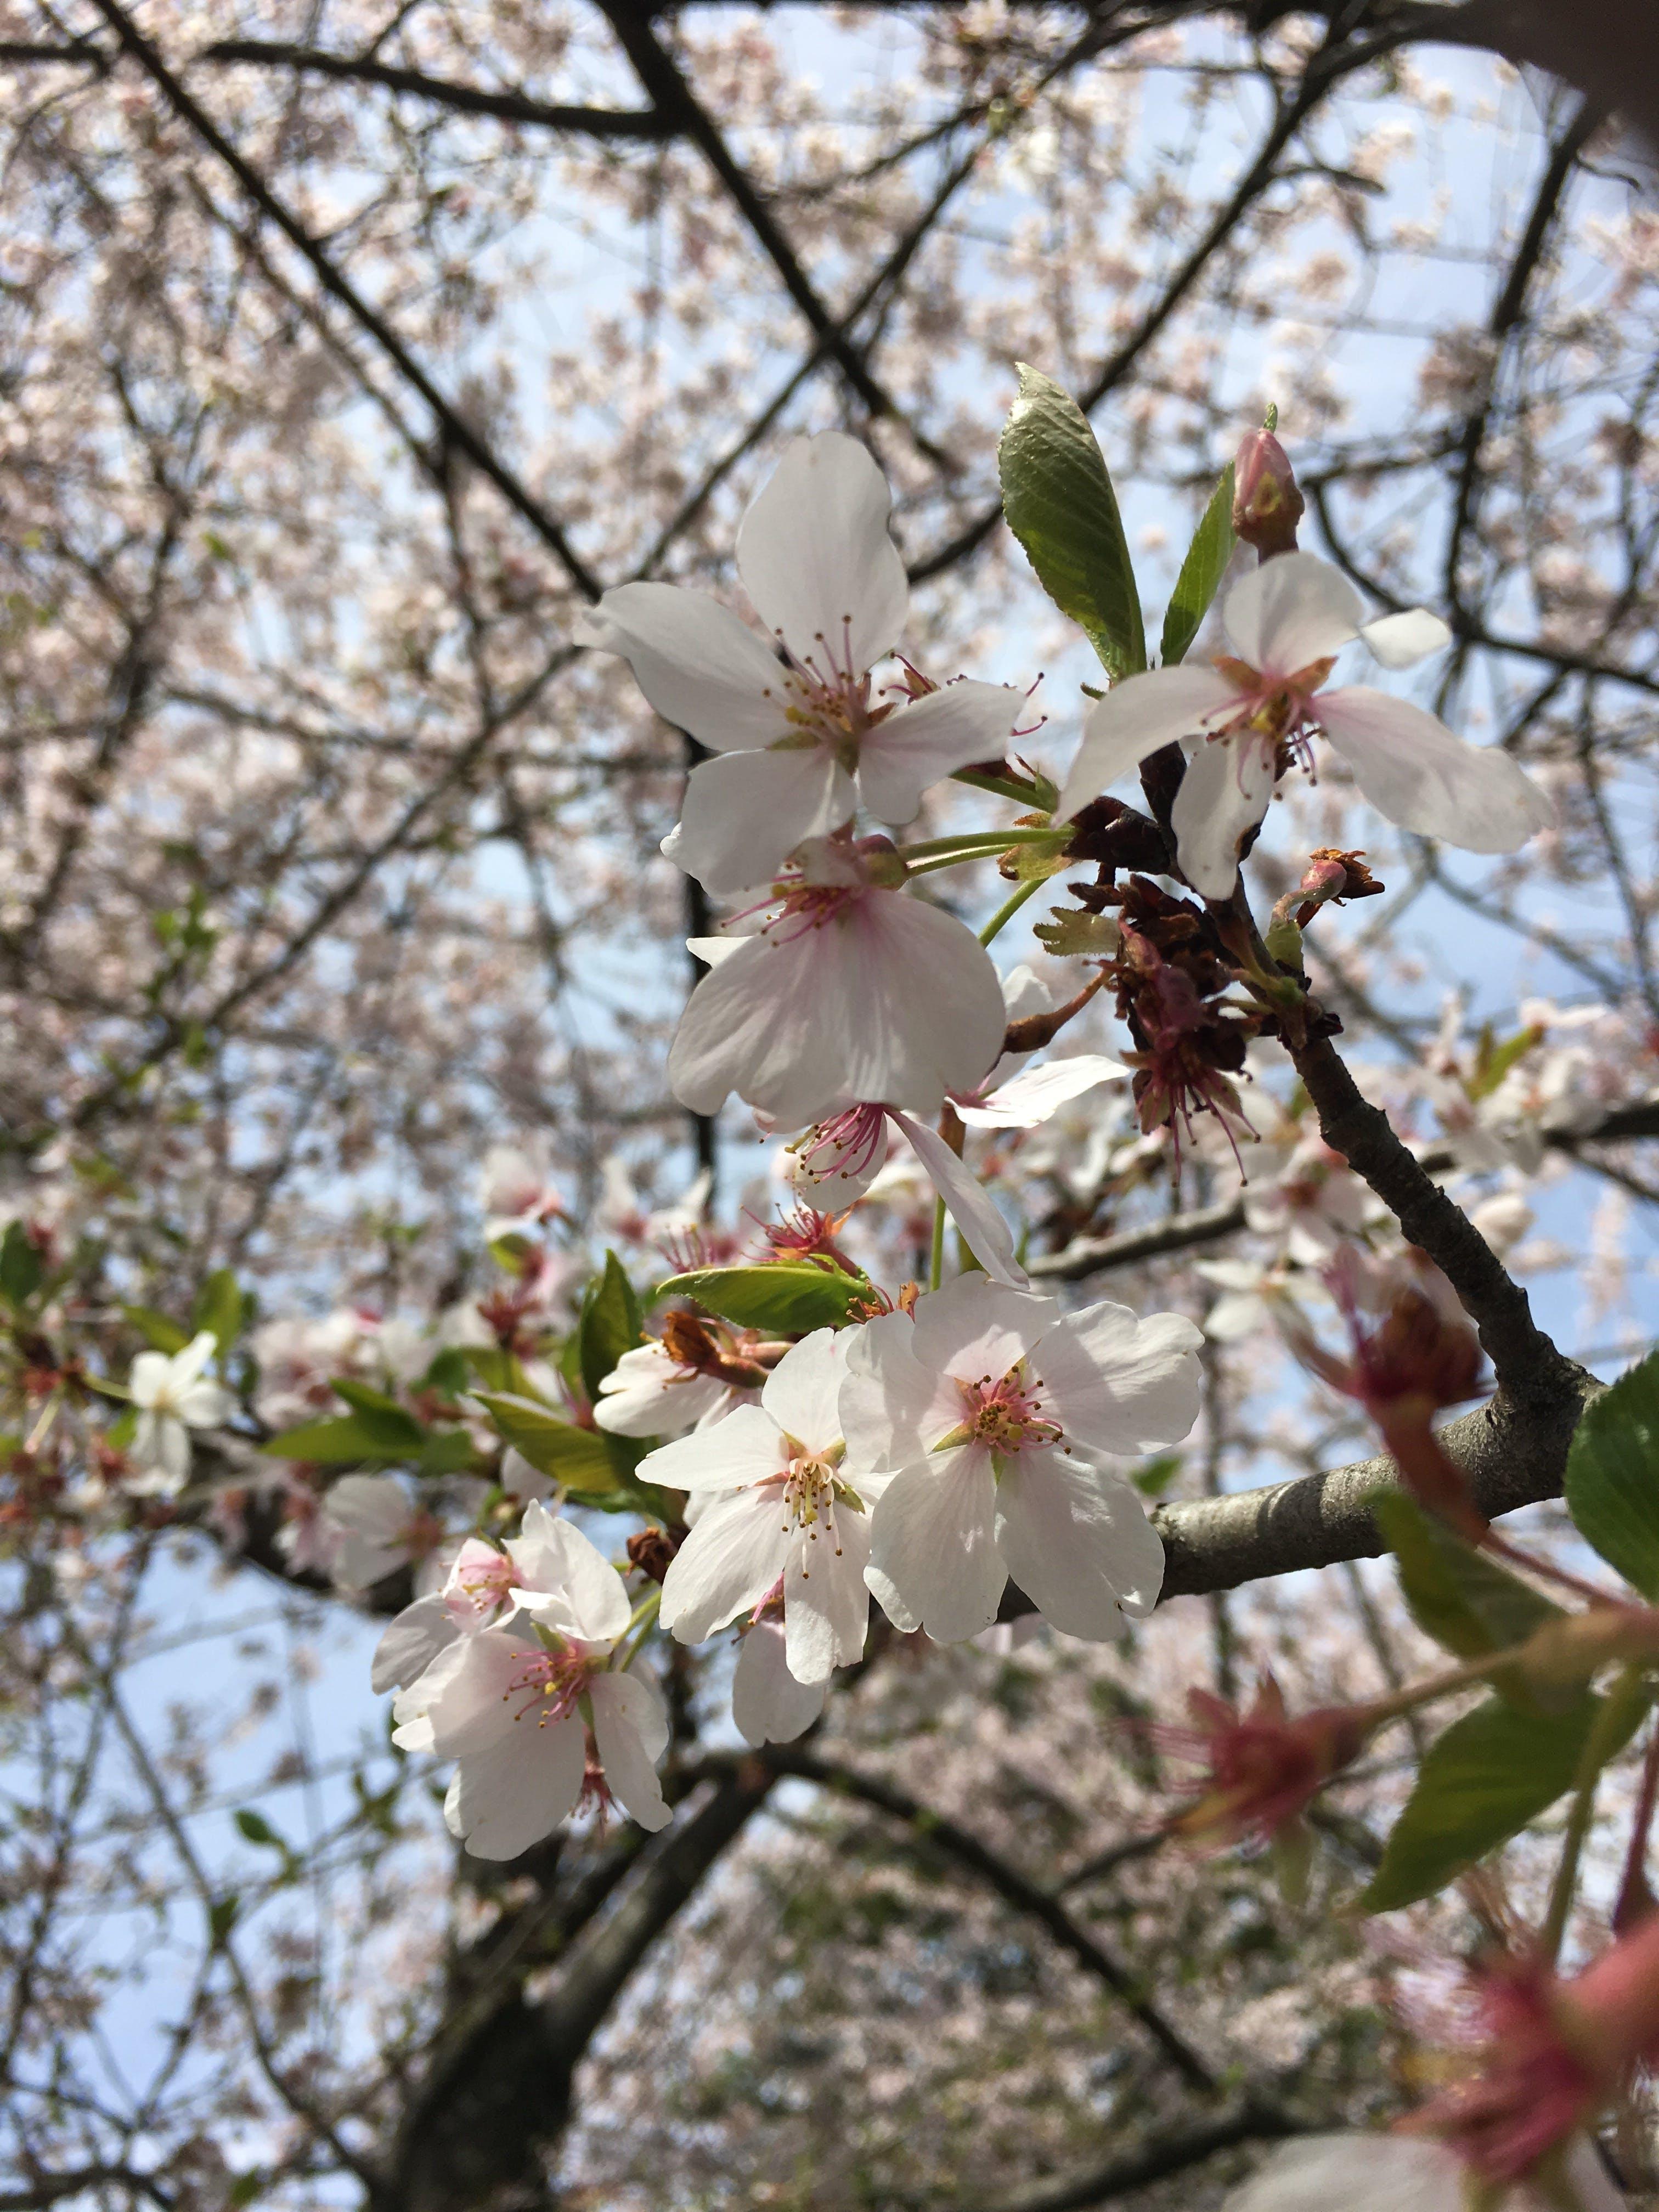 Free stock photo of beautiful flowers, cherry blossom, flowers, tree